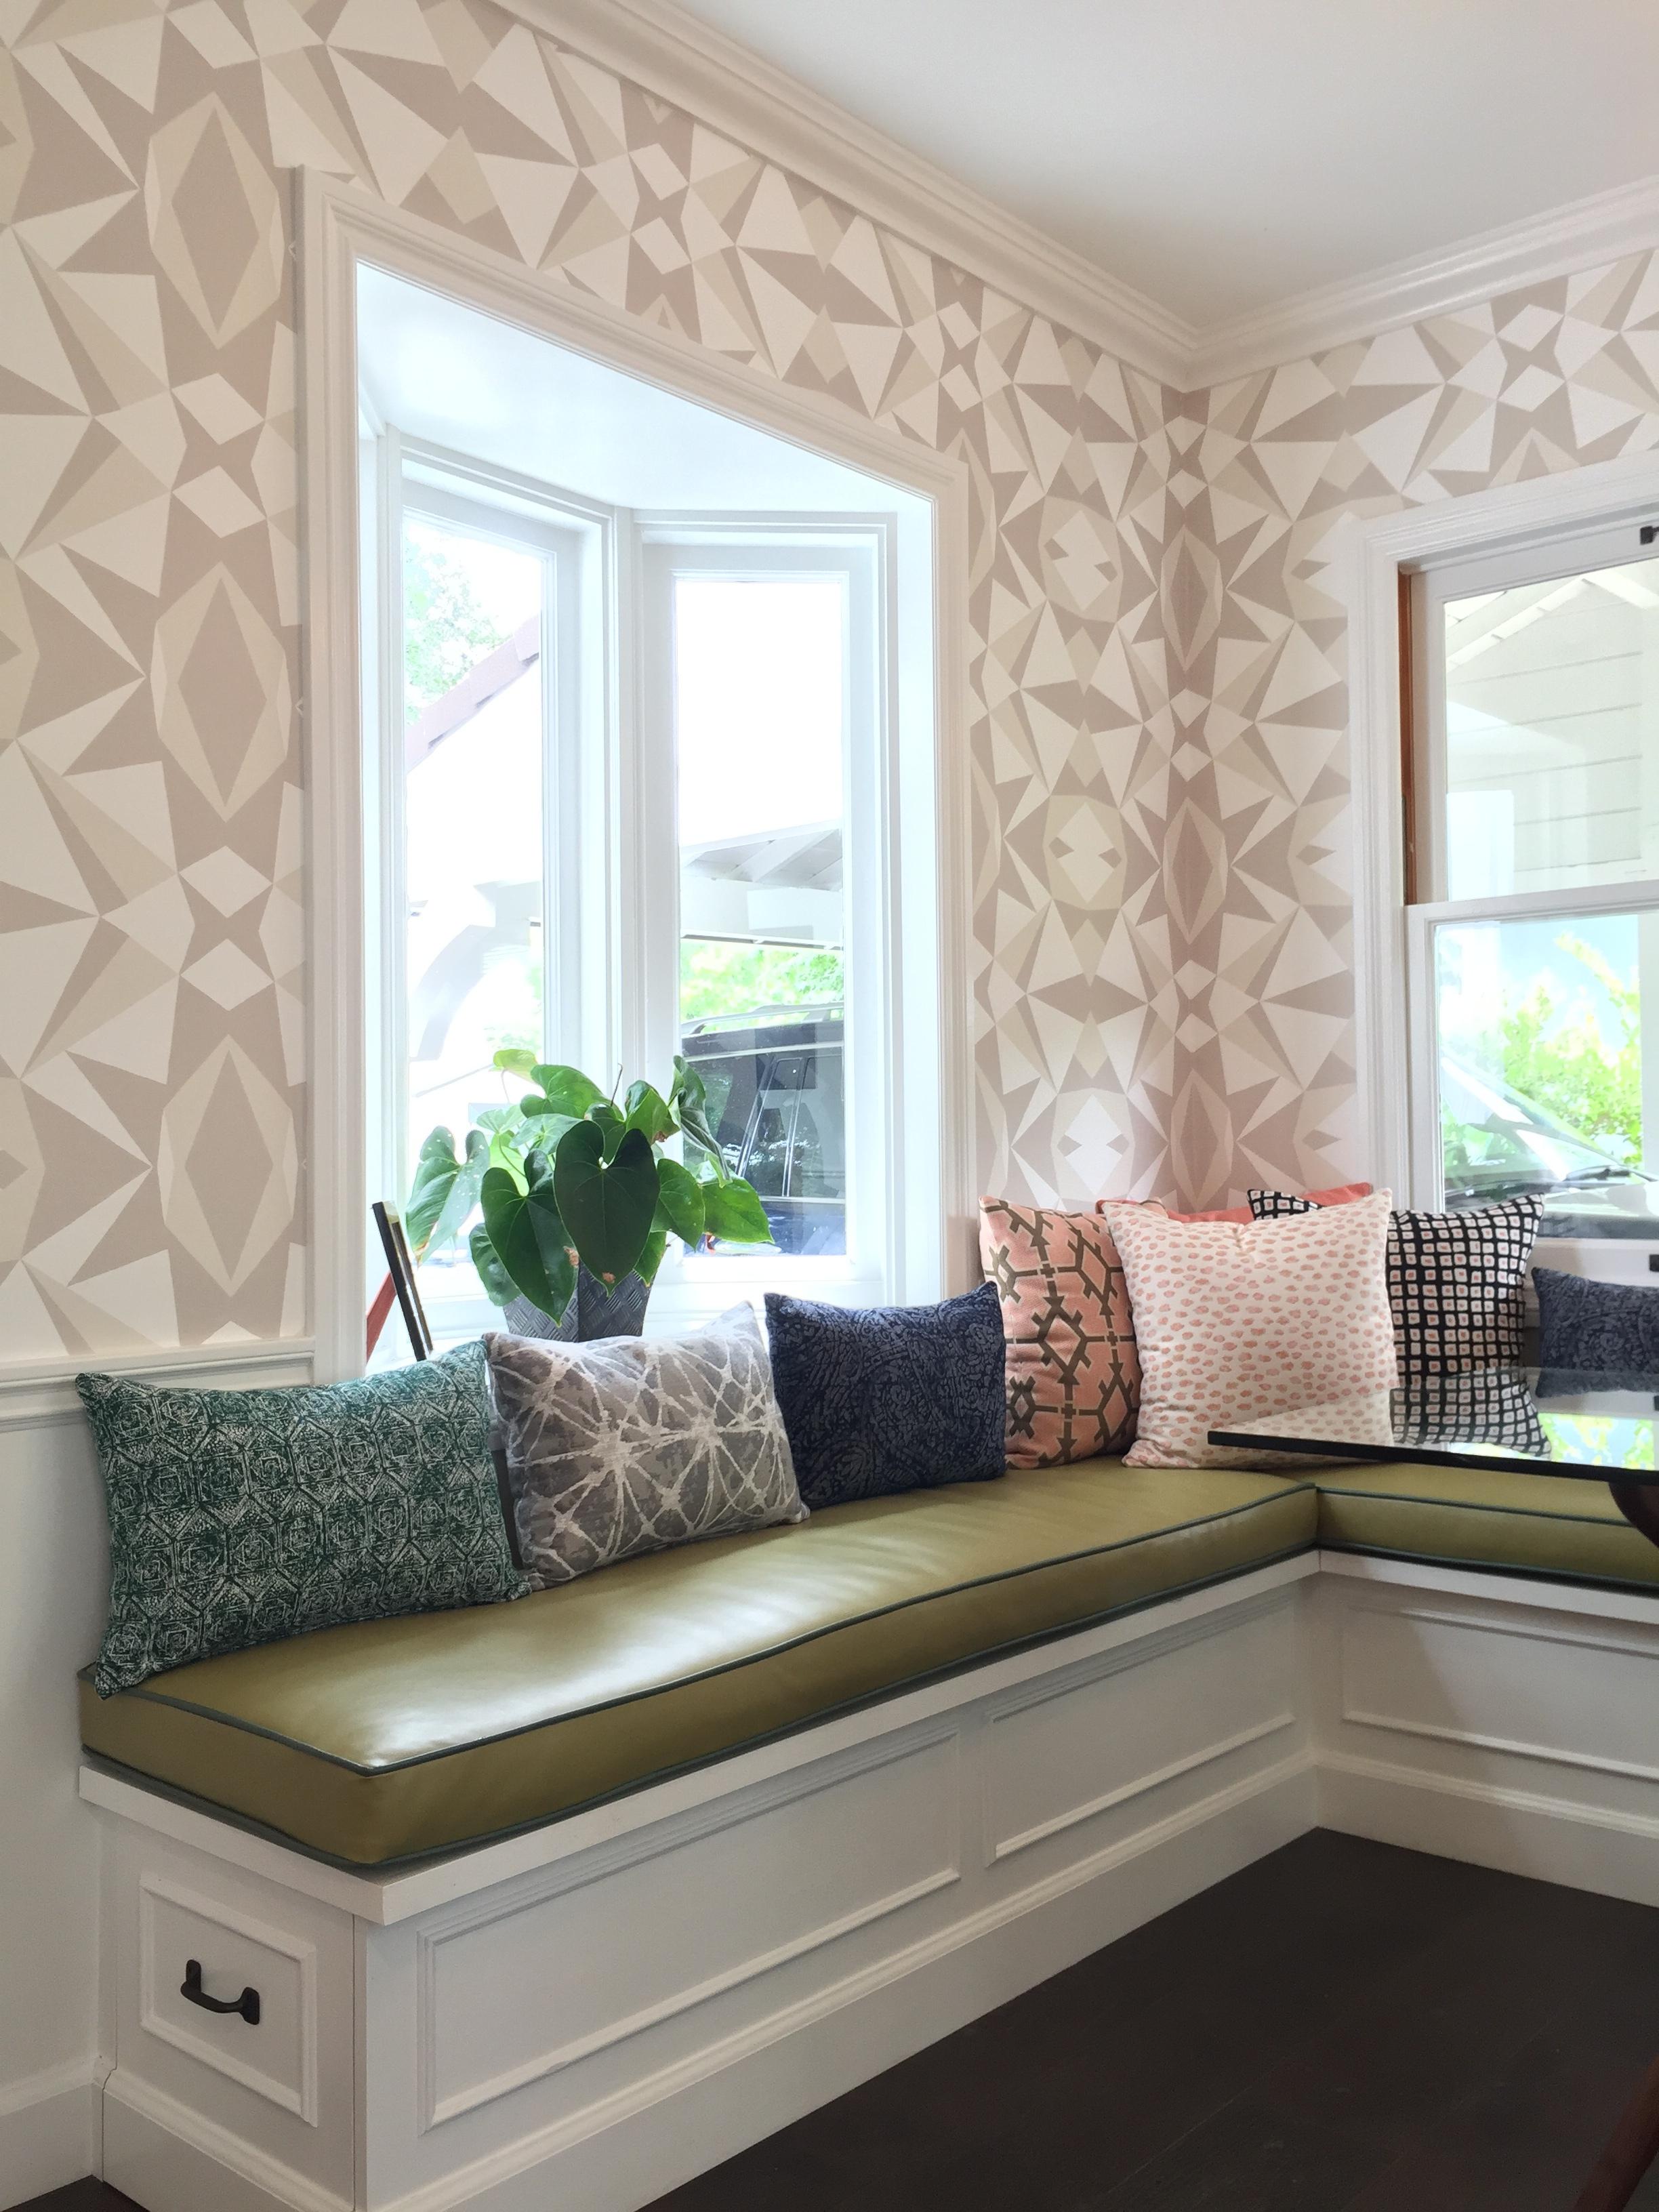 STONE TEXTILE MOSAIC IN NATURAL Designer: Stone Textile Studio